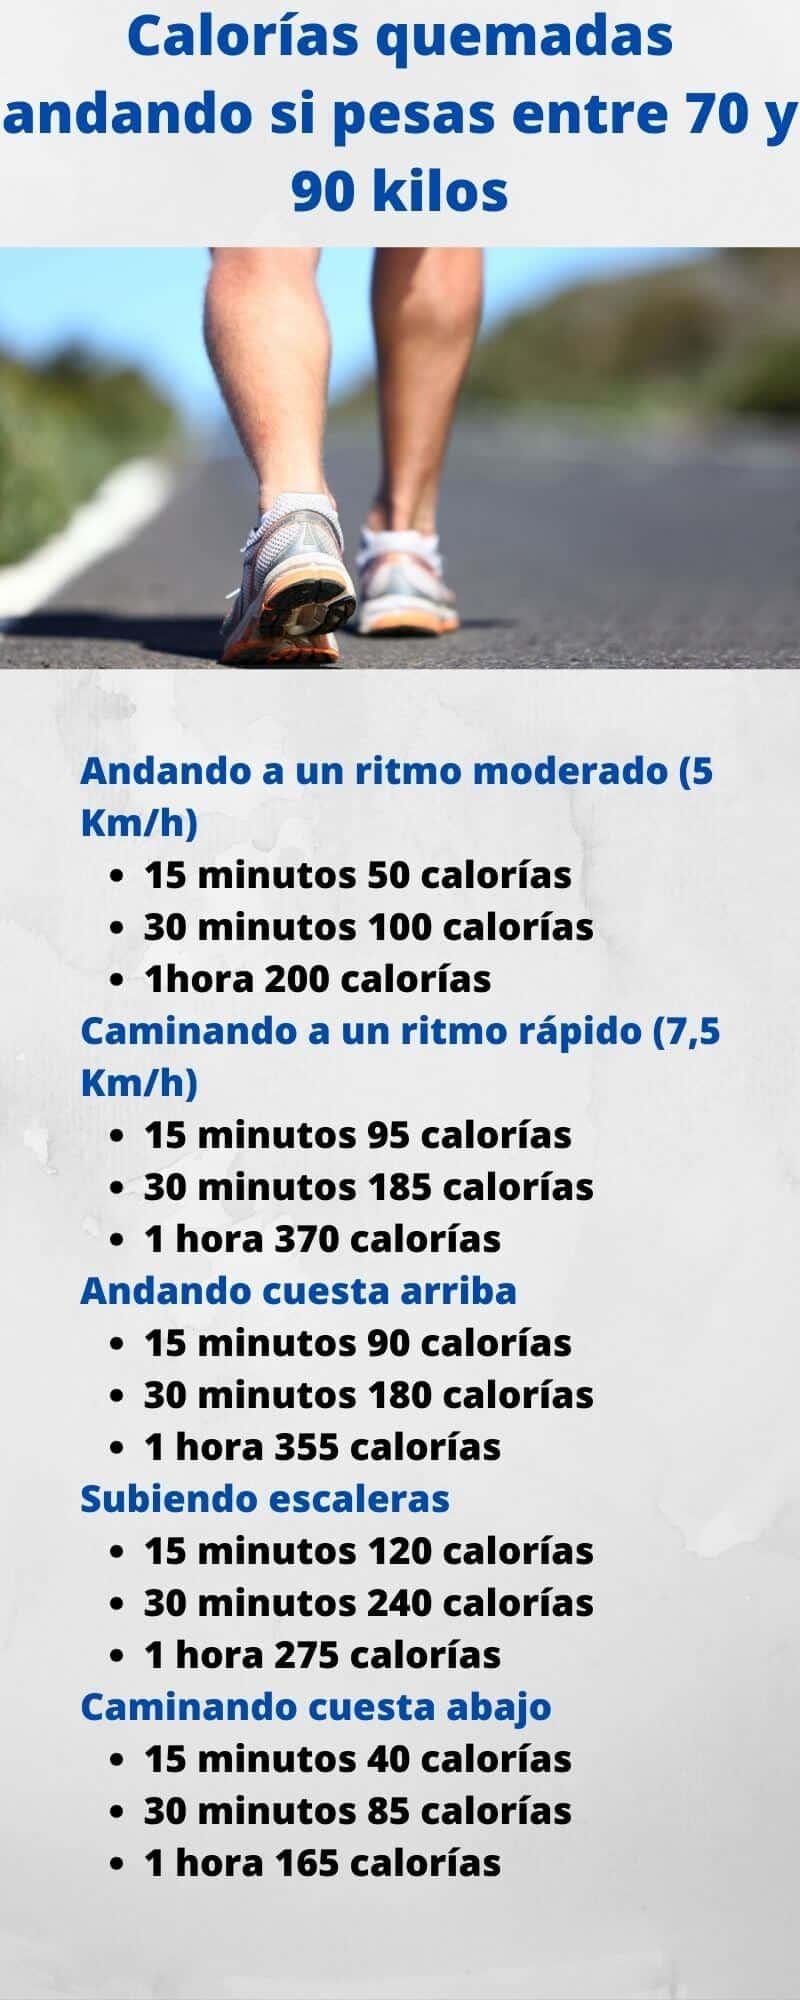 Infografia de calorías quemadas caminando para hombres de entre 70 y 90 kilos de peso